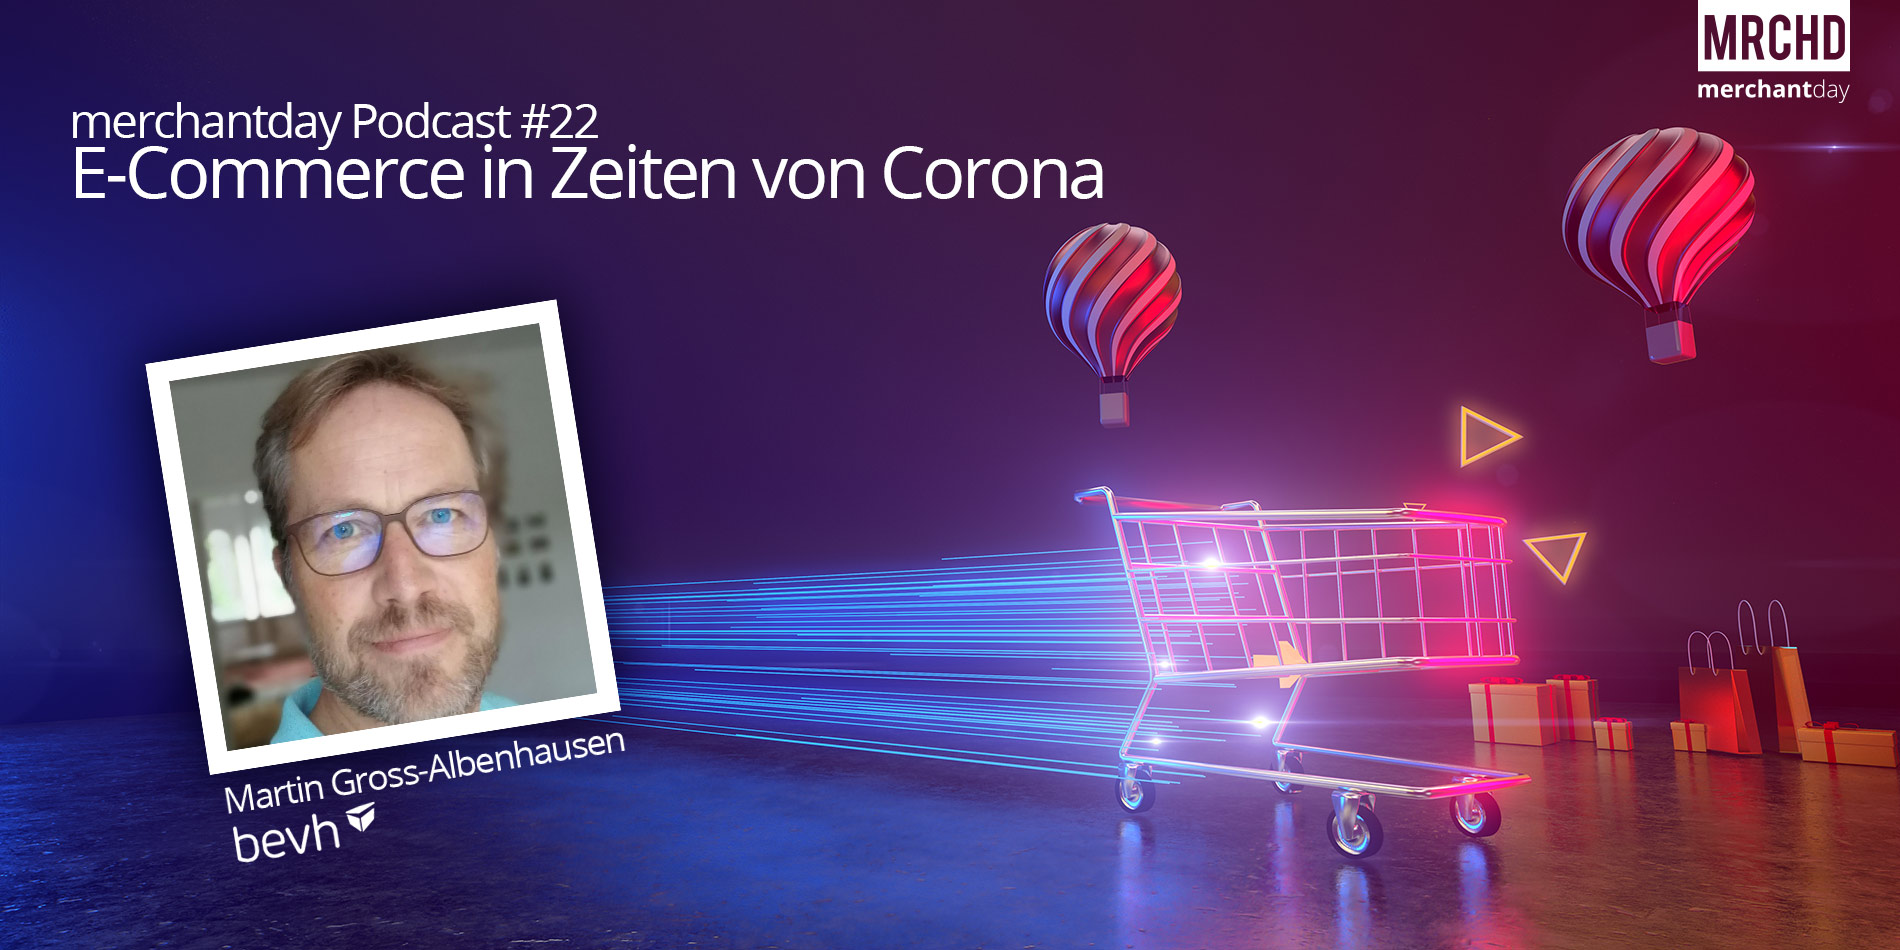 e-commerce-corona-2019-2020-studie-merchantday-podcast-interview-bevh-martin-gross-albenhausen